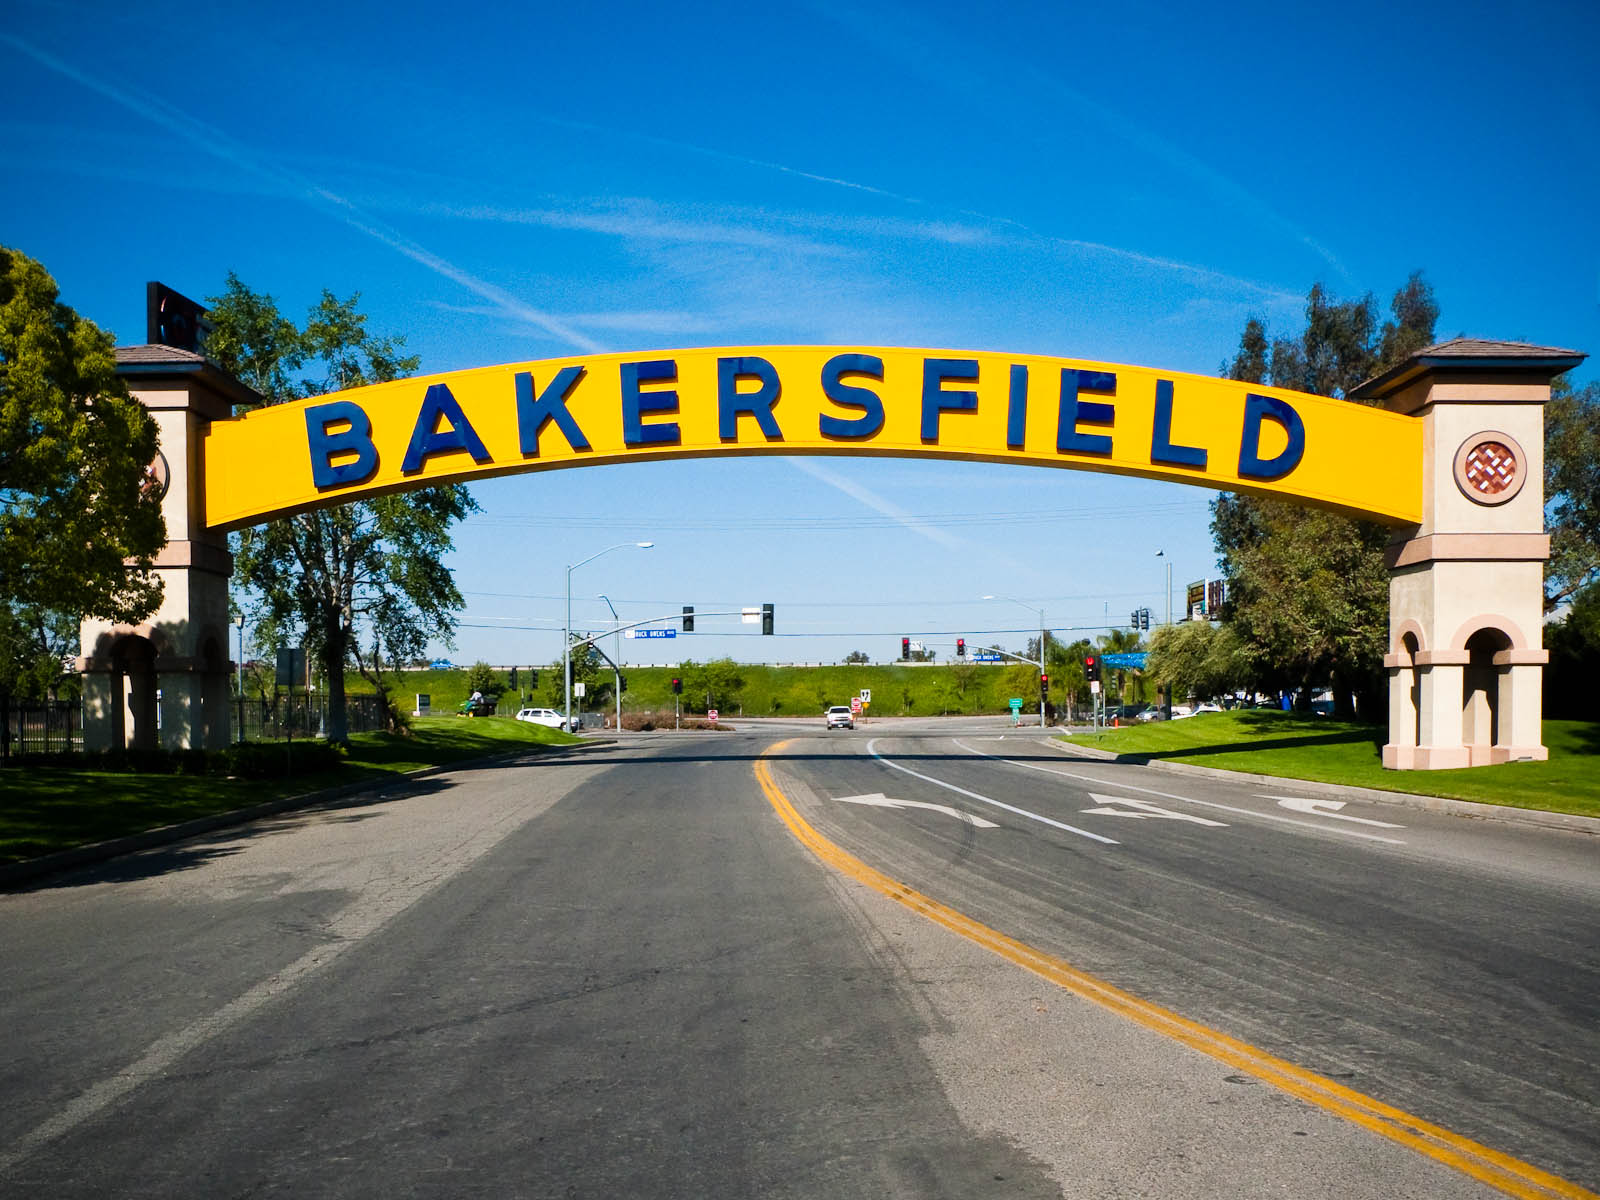 Bakersfield Breaking News The Bakersfield Breeze Offers the Latest News in Bakersfield, California